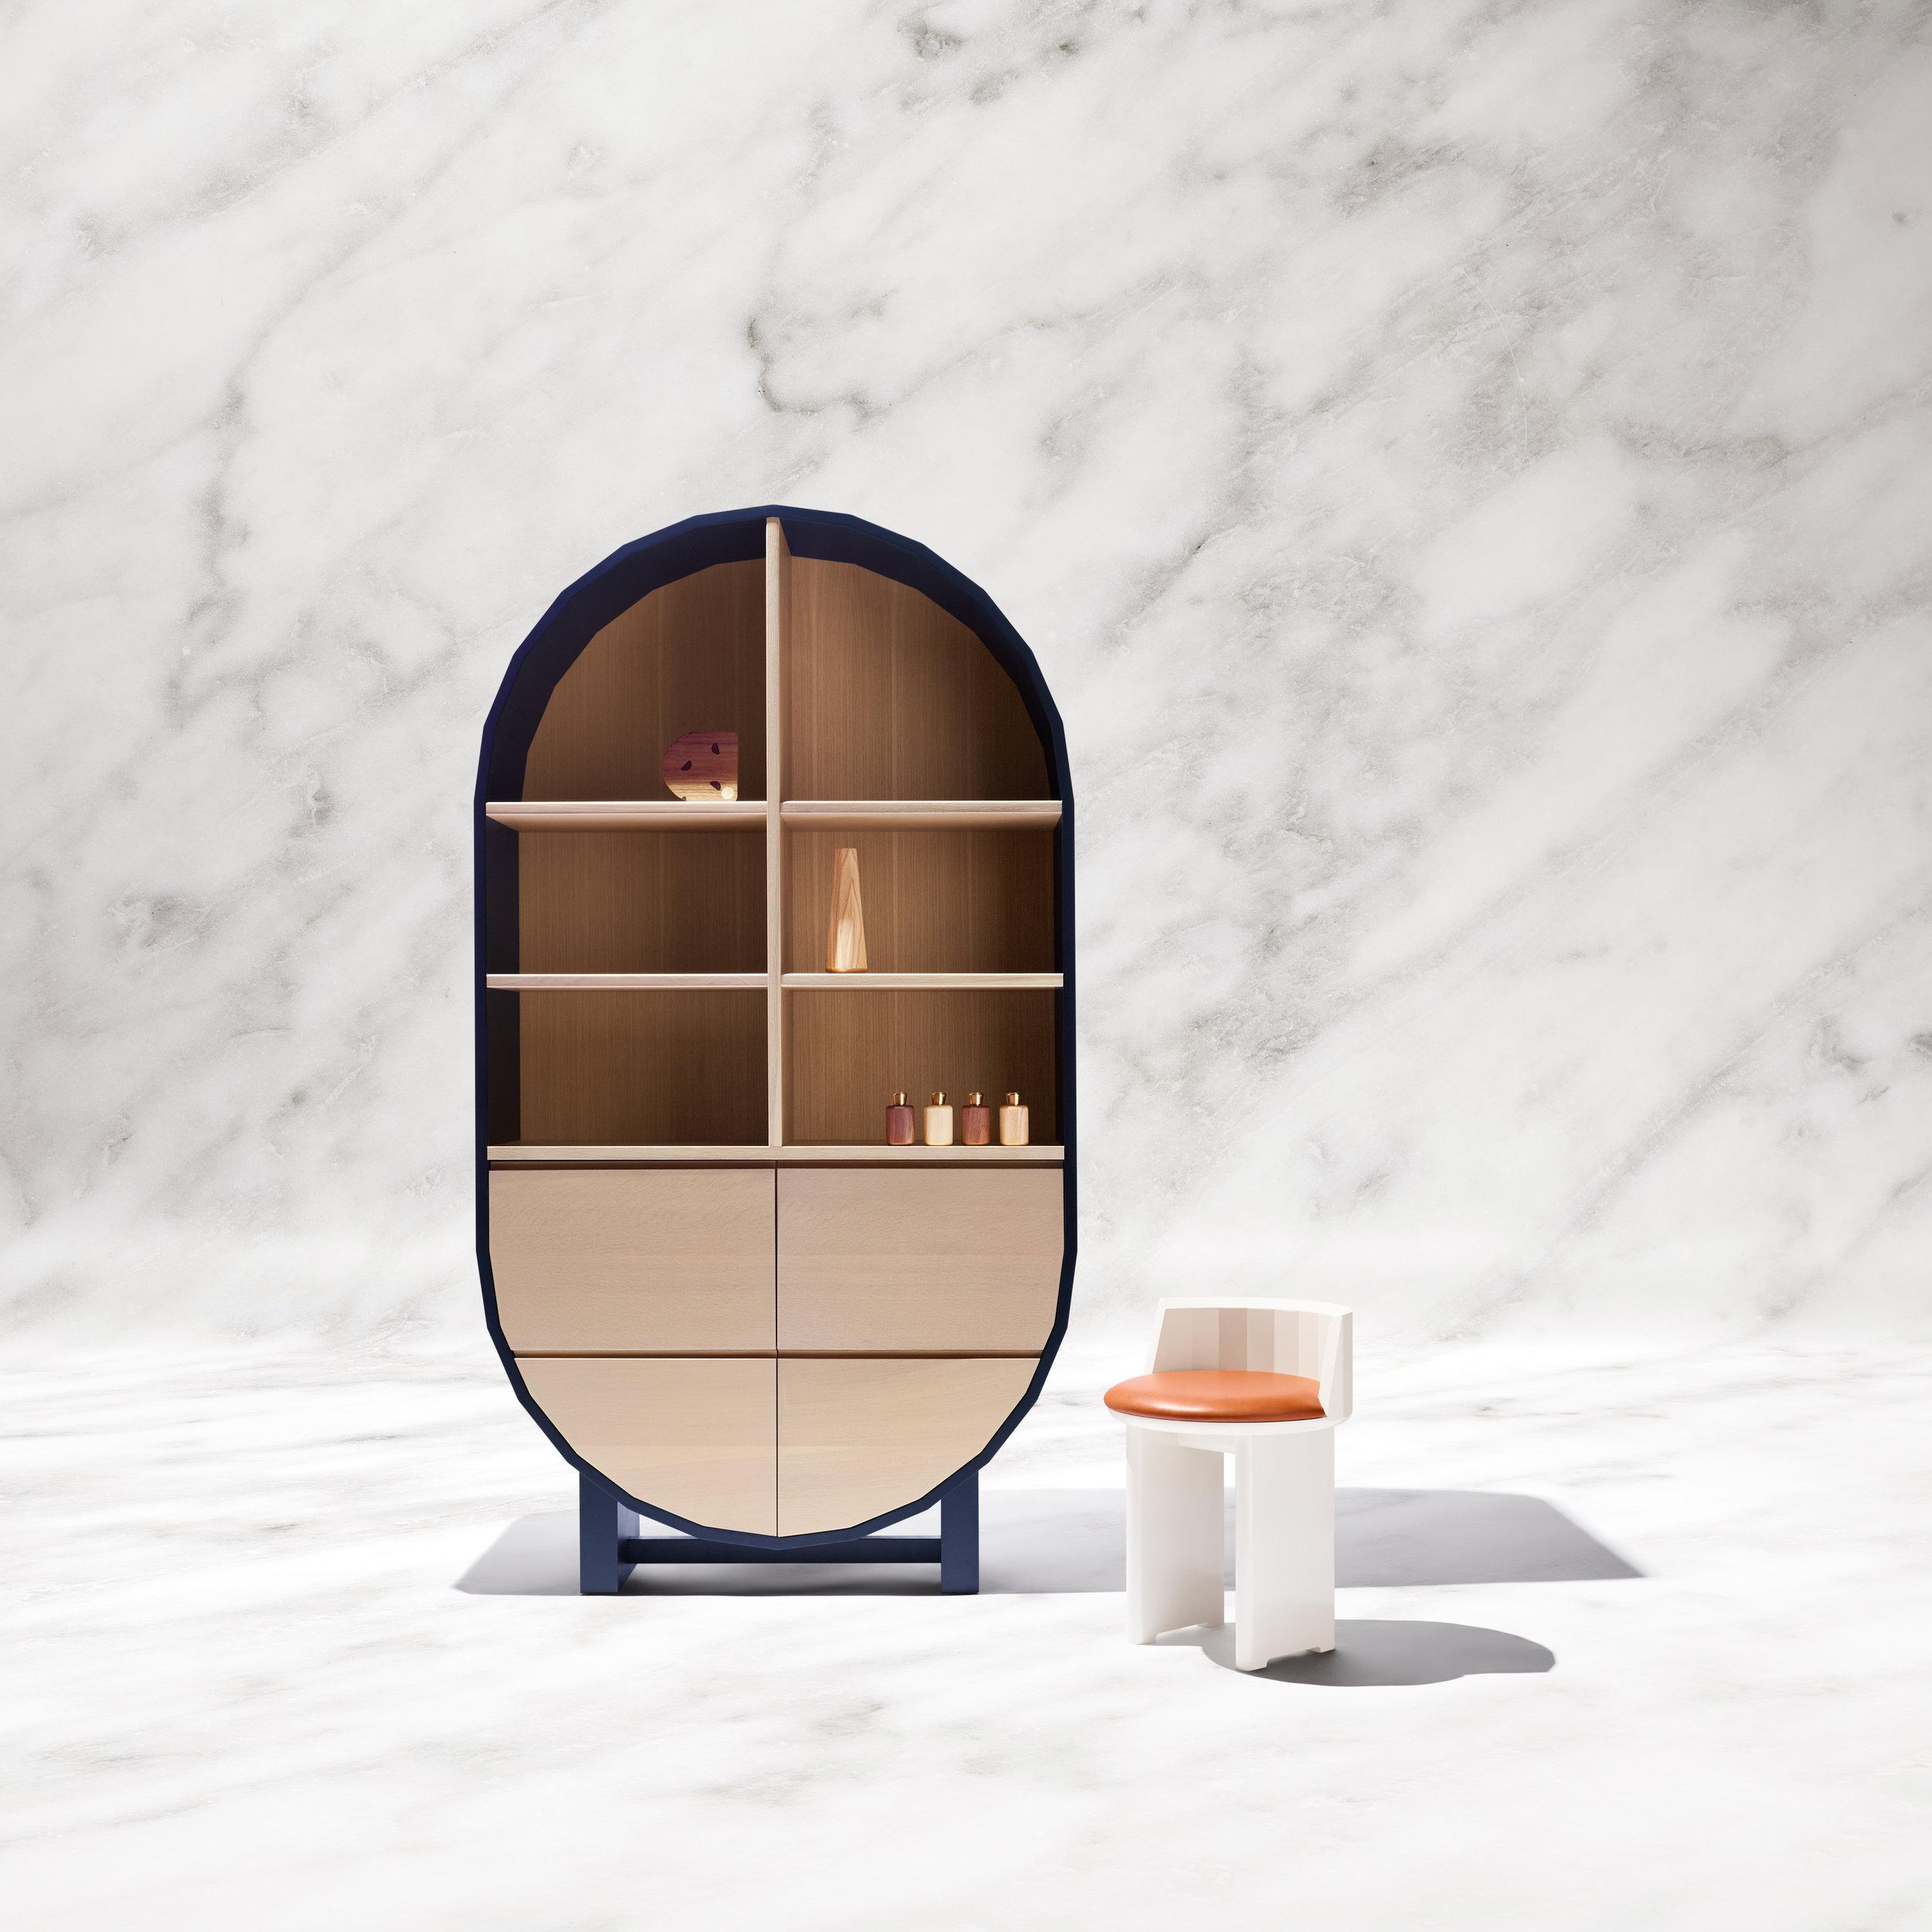 Furniture_FINAL1.jpg